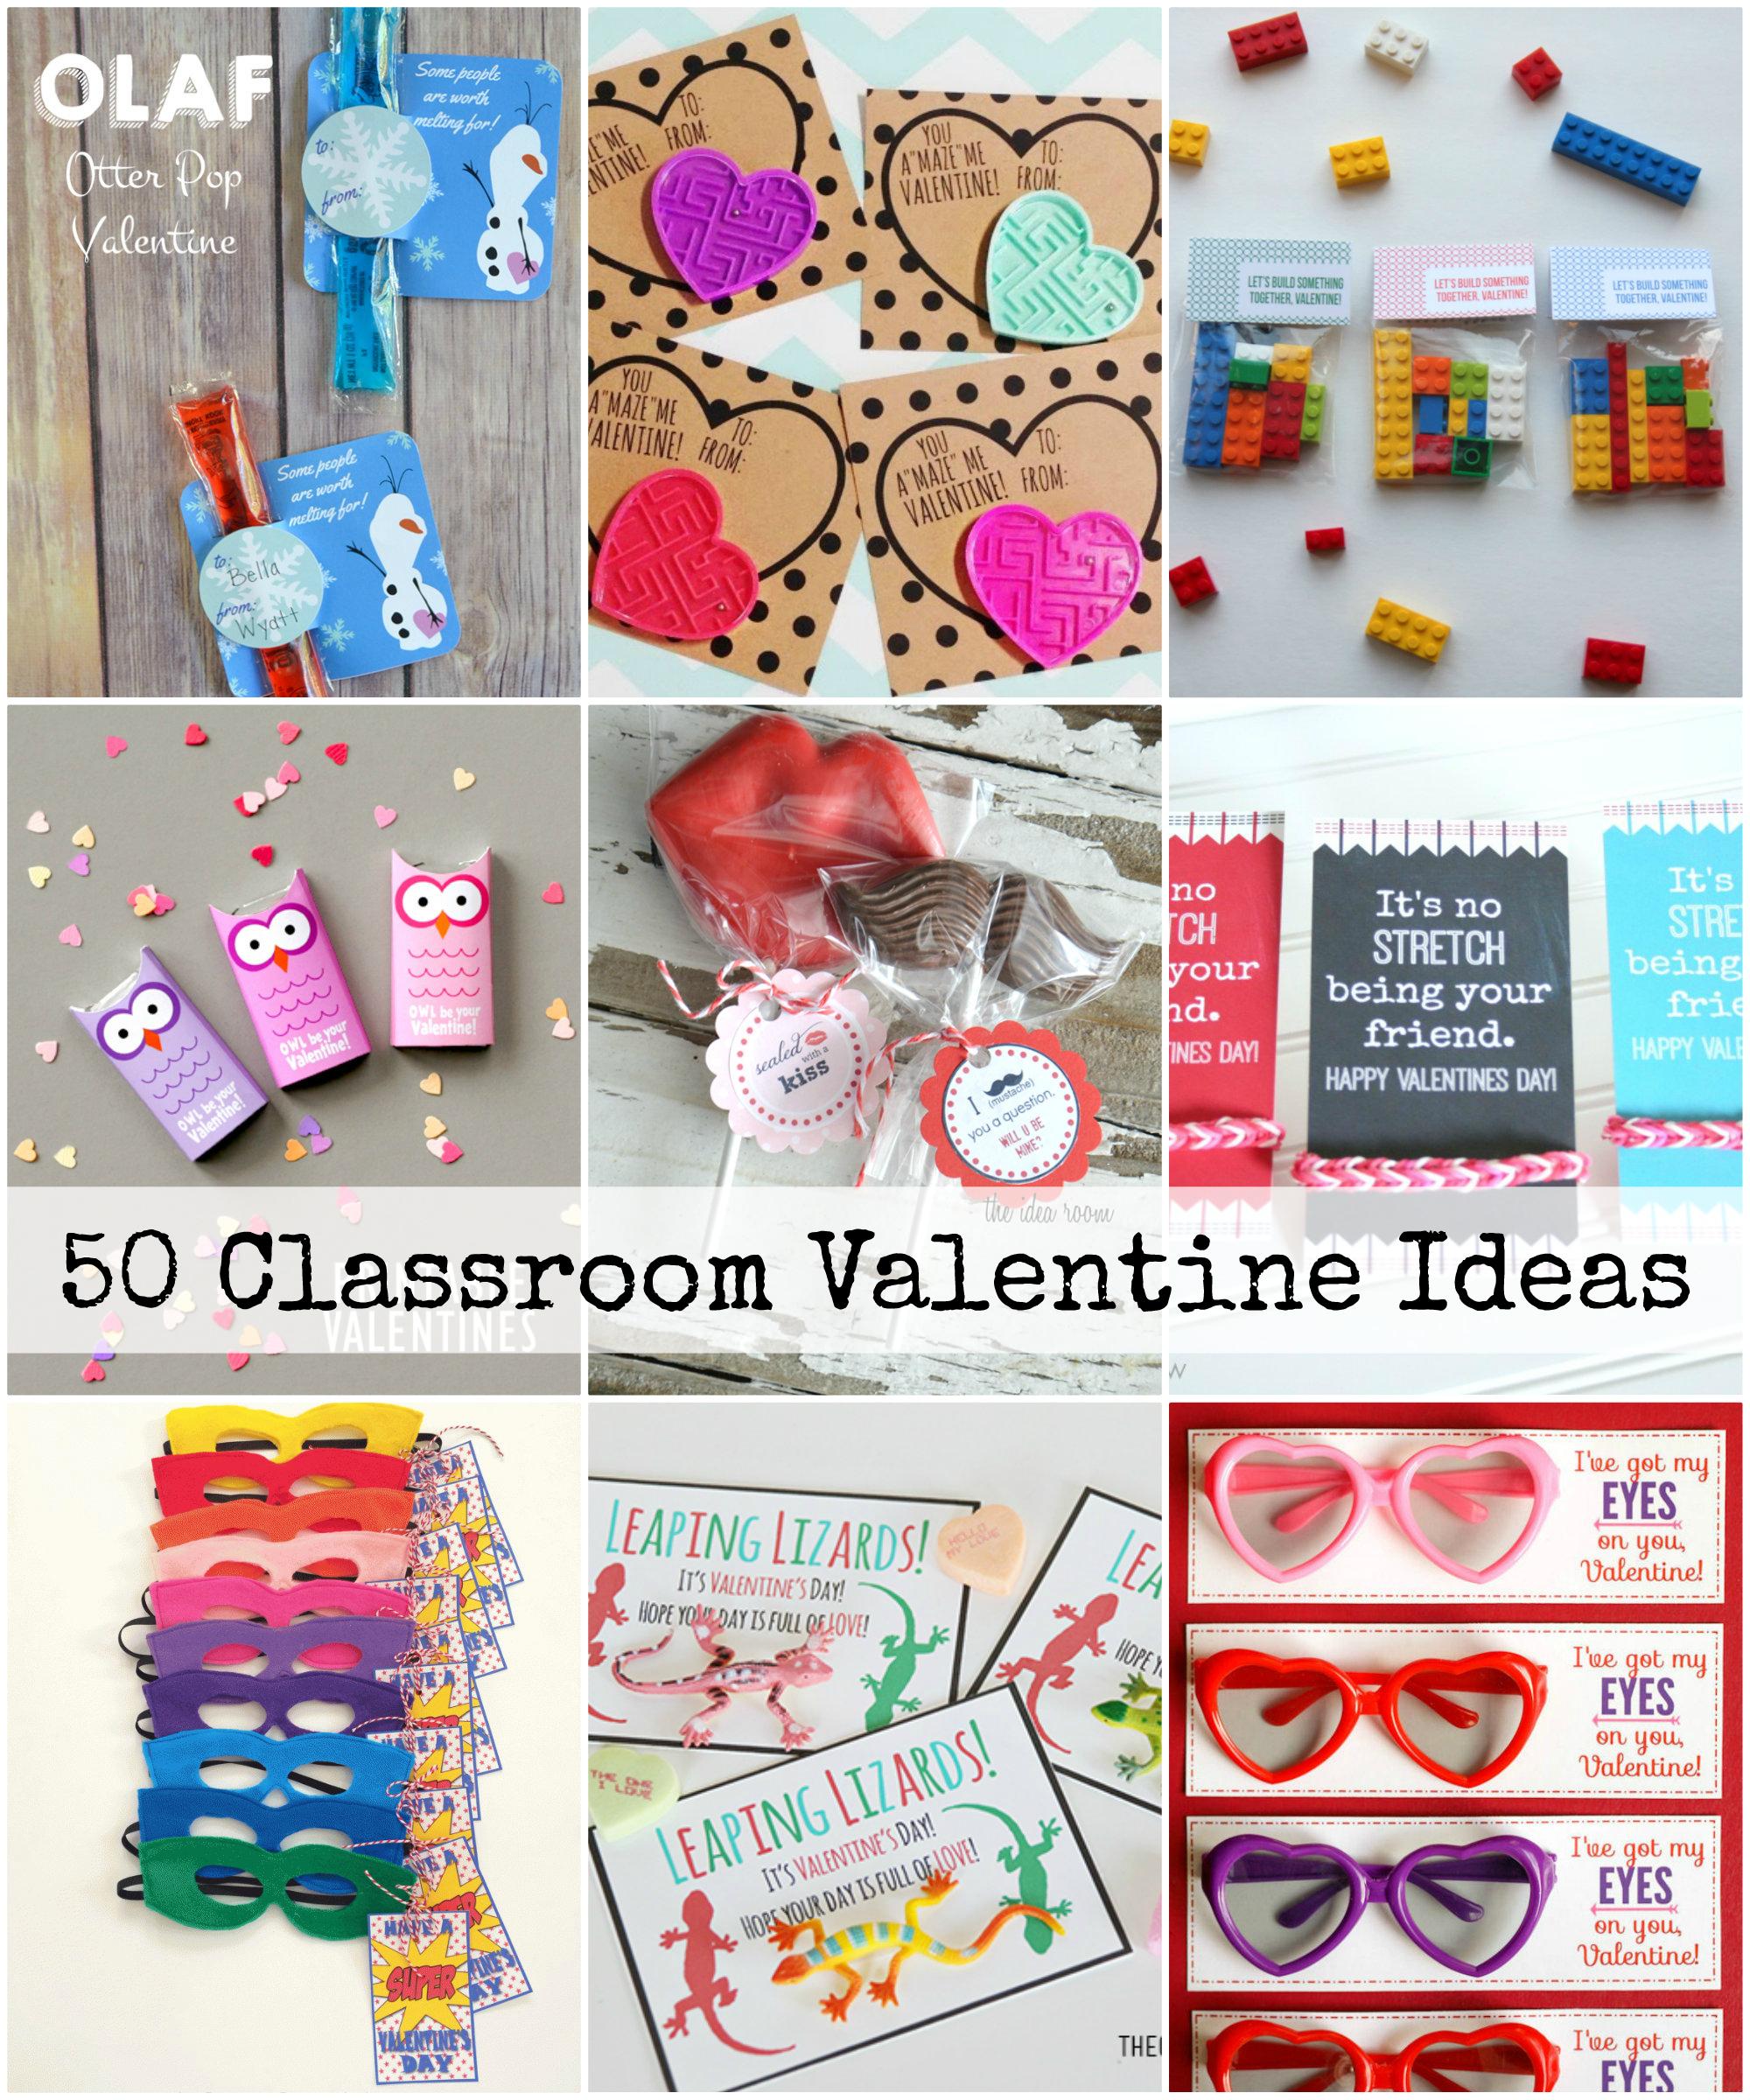 Valentine's Day Classroom Box Ideas - The Idea Room